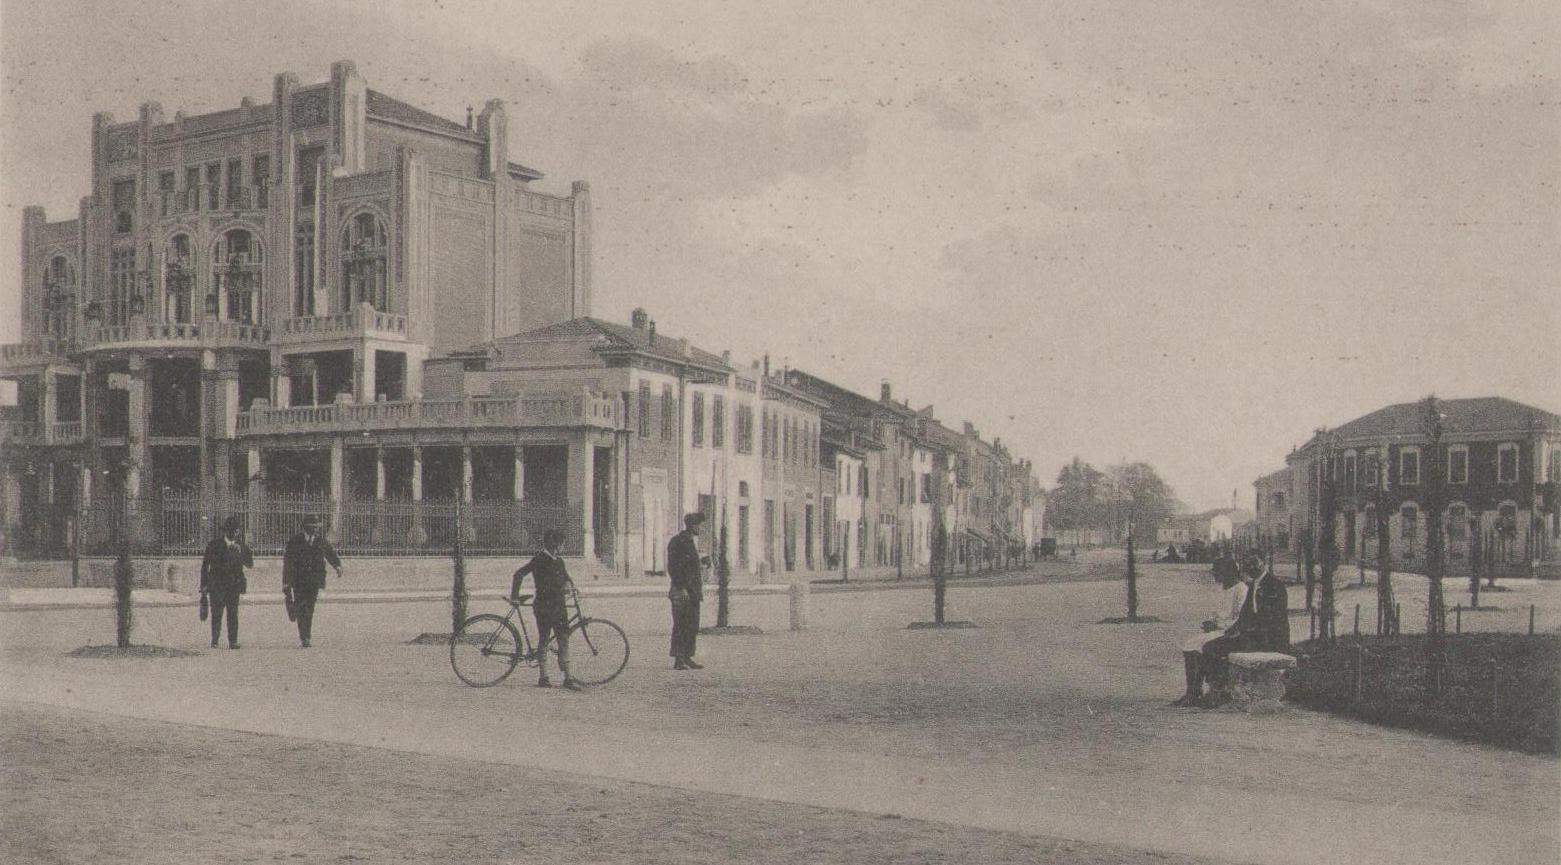 Palazzo Panfilio, primi anni '20 - da https://www.facebook.com/ferraraincartolina/